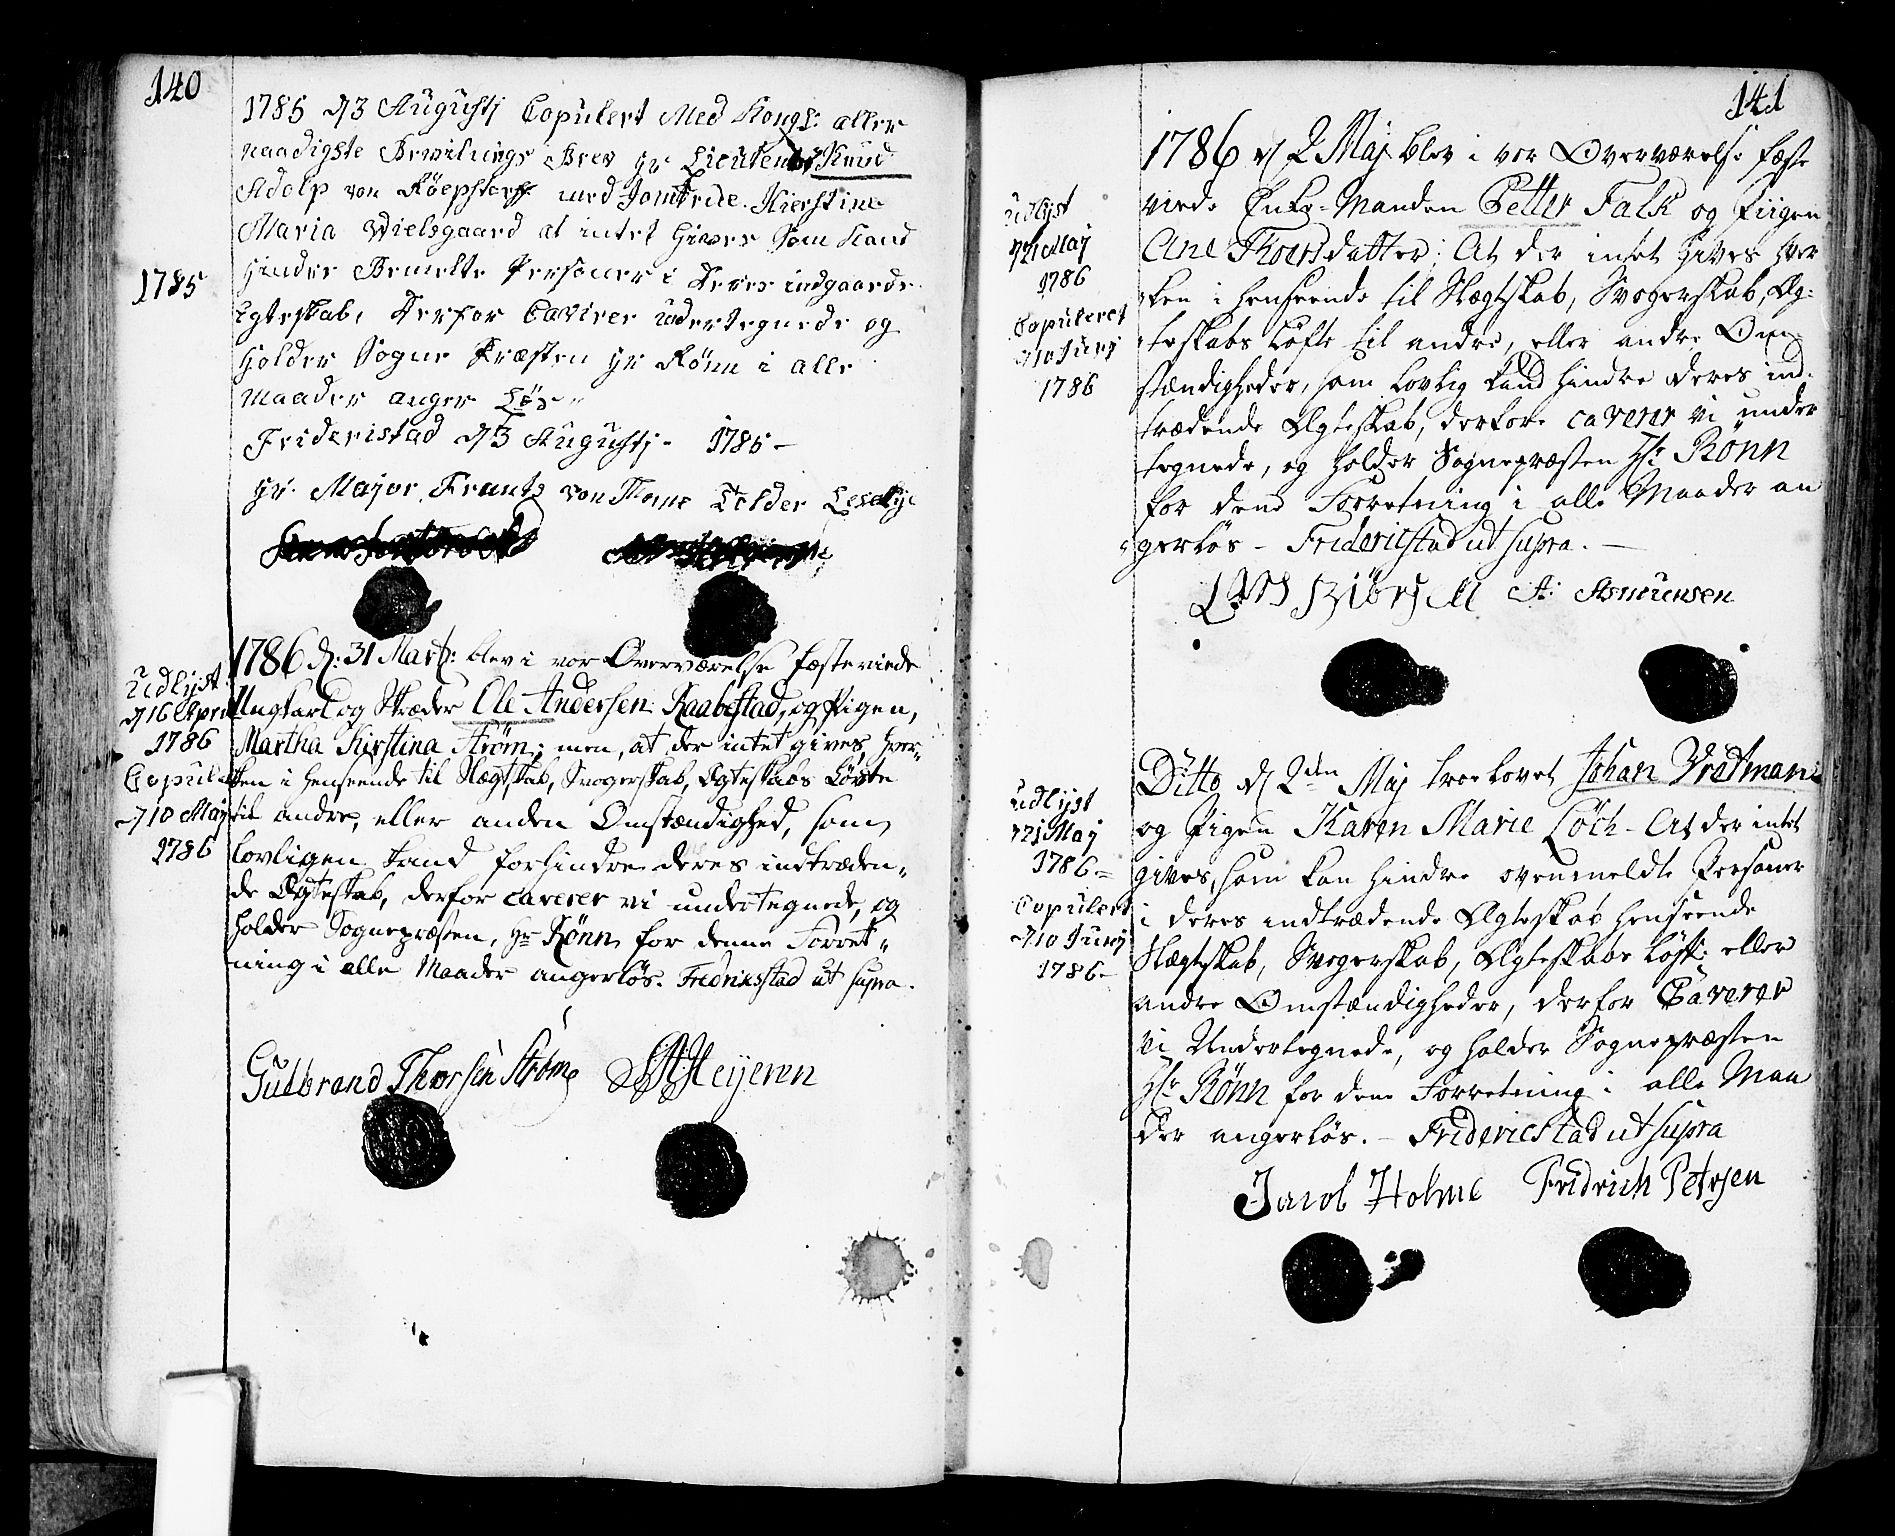 SAO, Fredrikstad prestekontor Kirkebøker, F/Fa/L0002: Ministerialbok nr. 2, 1750-1804, s. 140-141